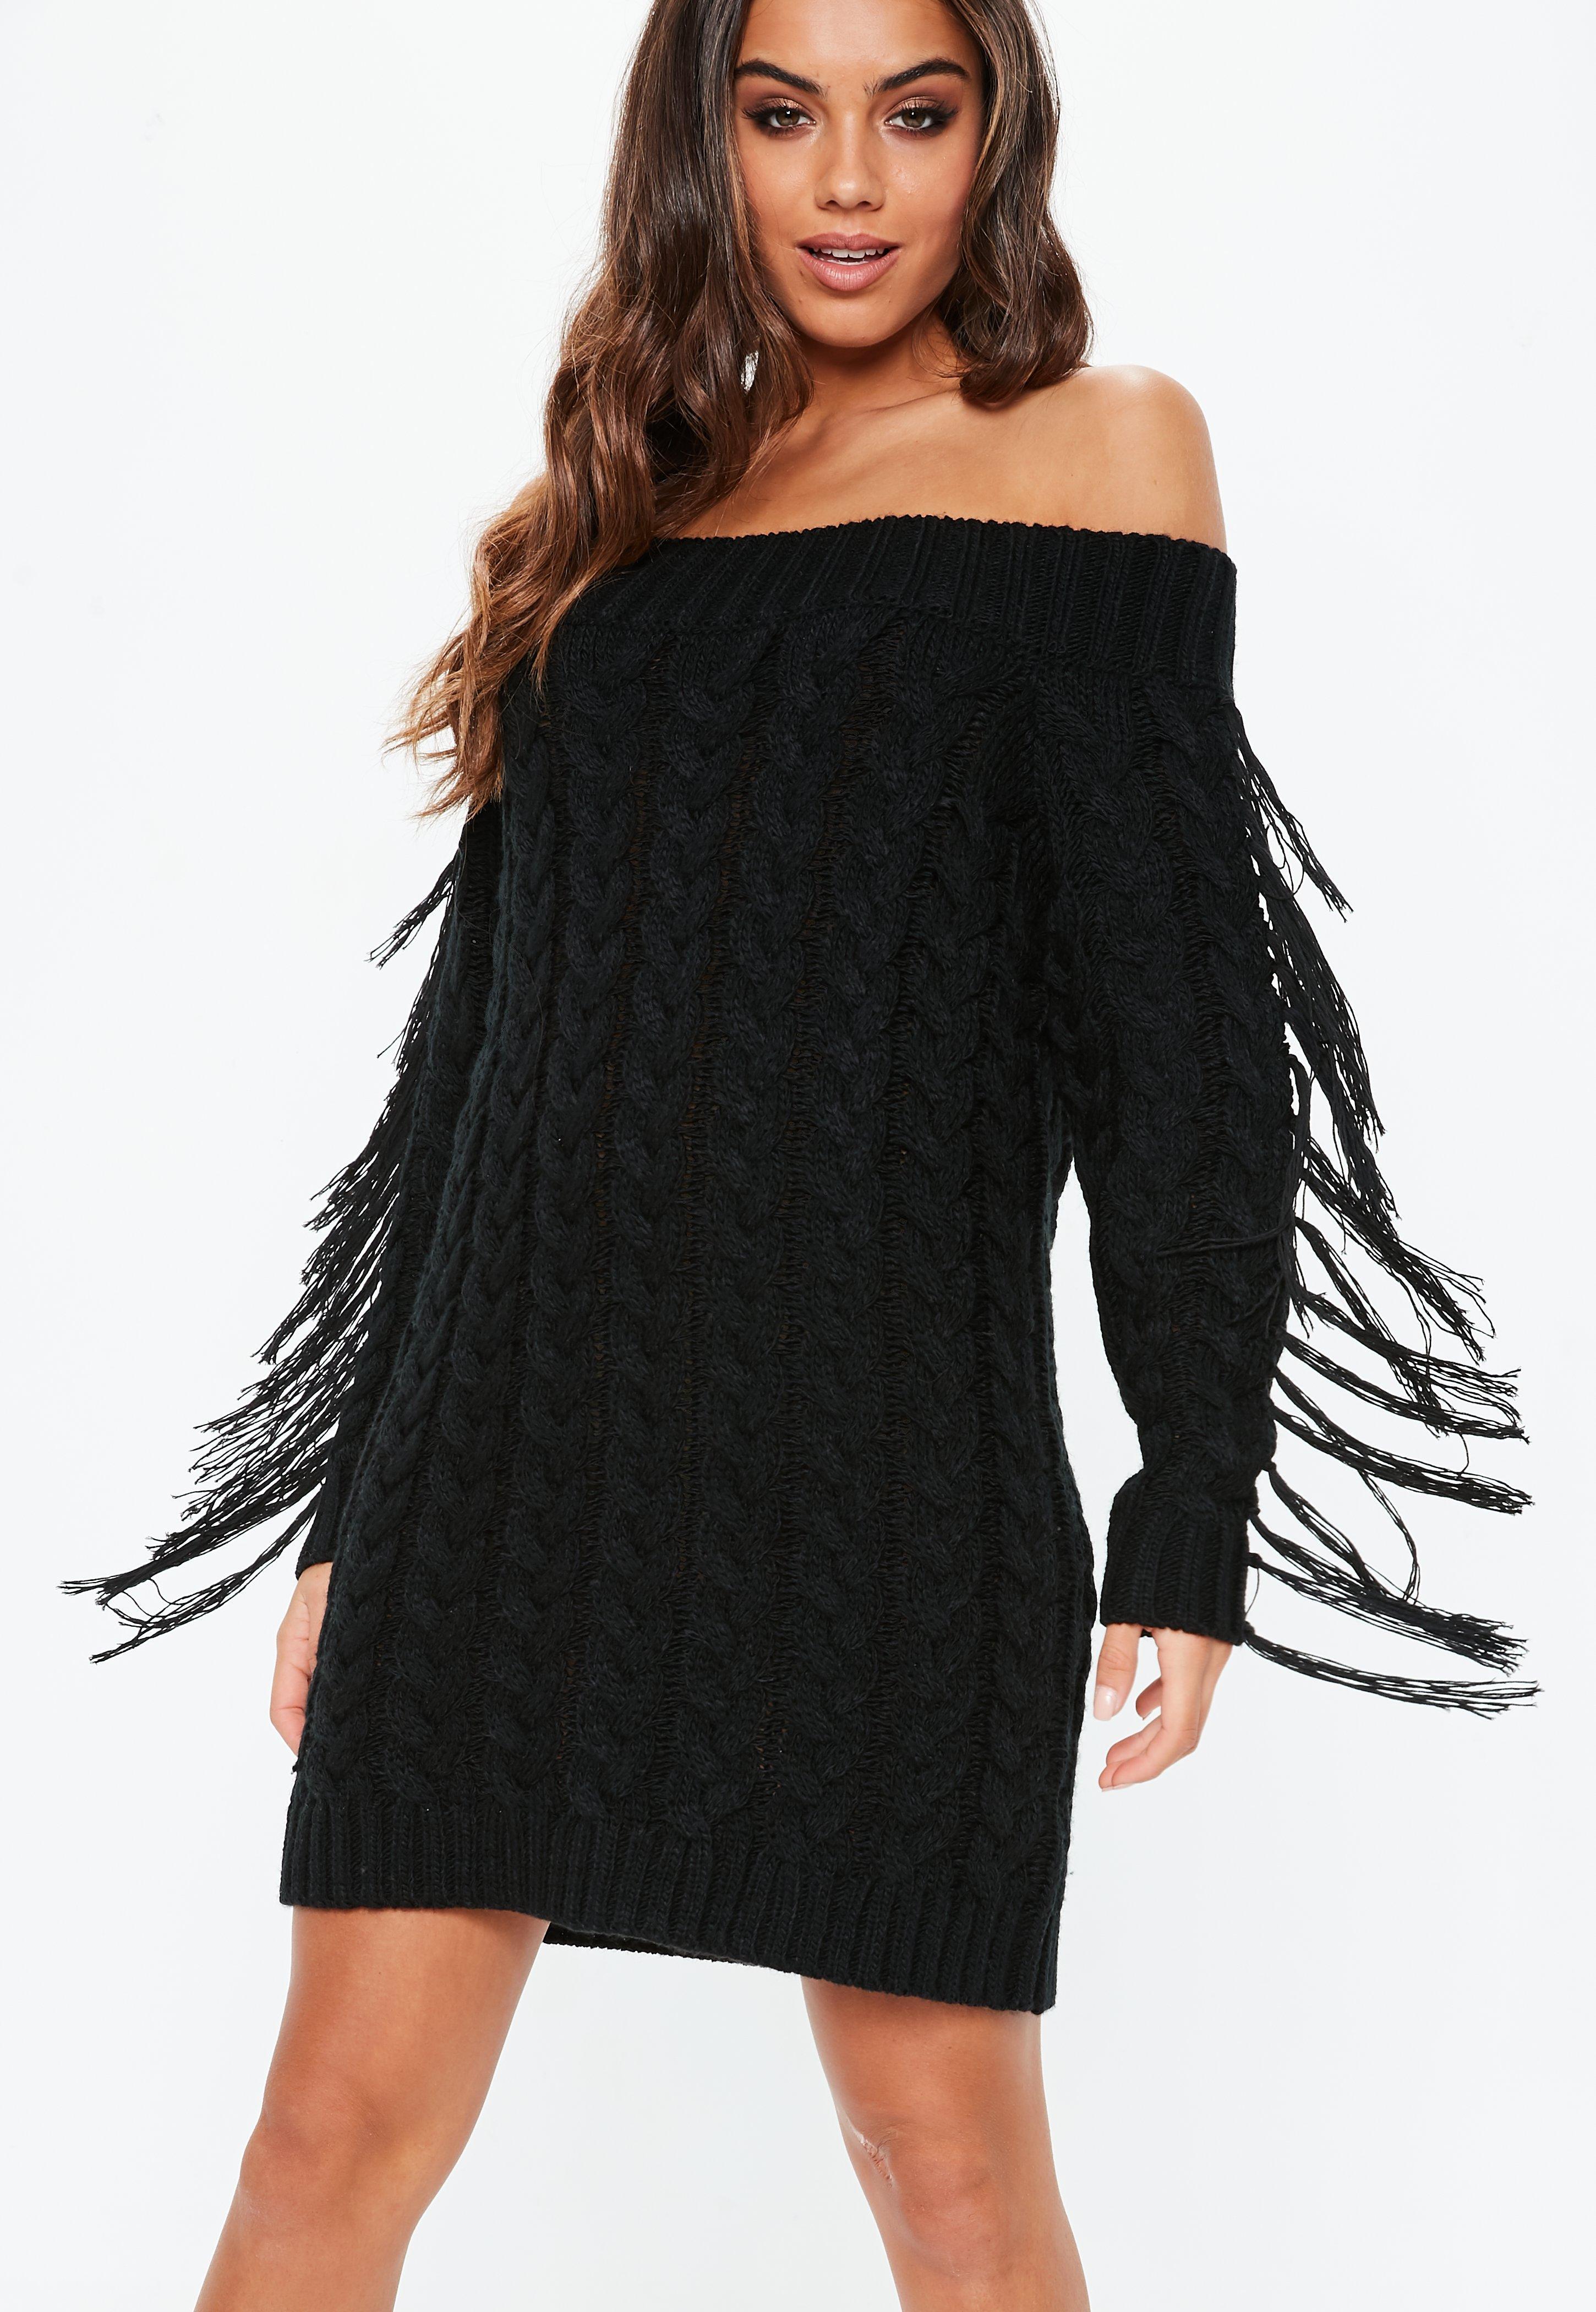 d915fac8f96 Black Fringe Cable Mini Dress | Missguided